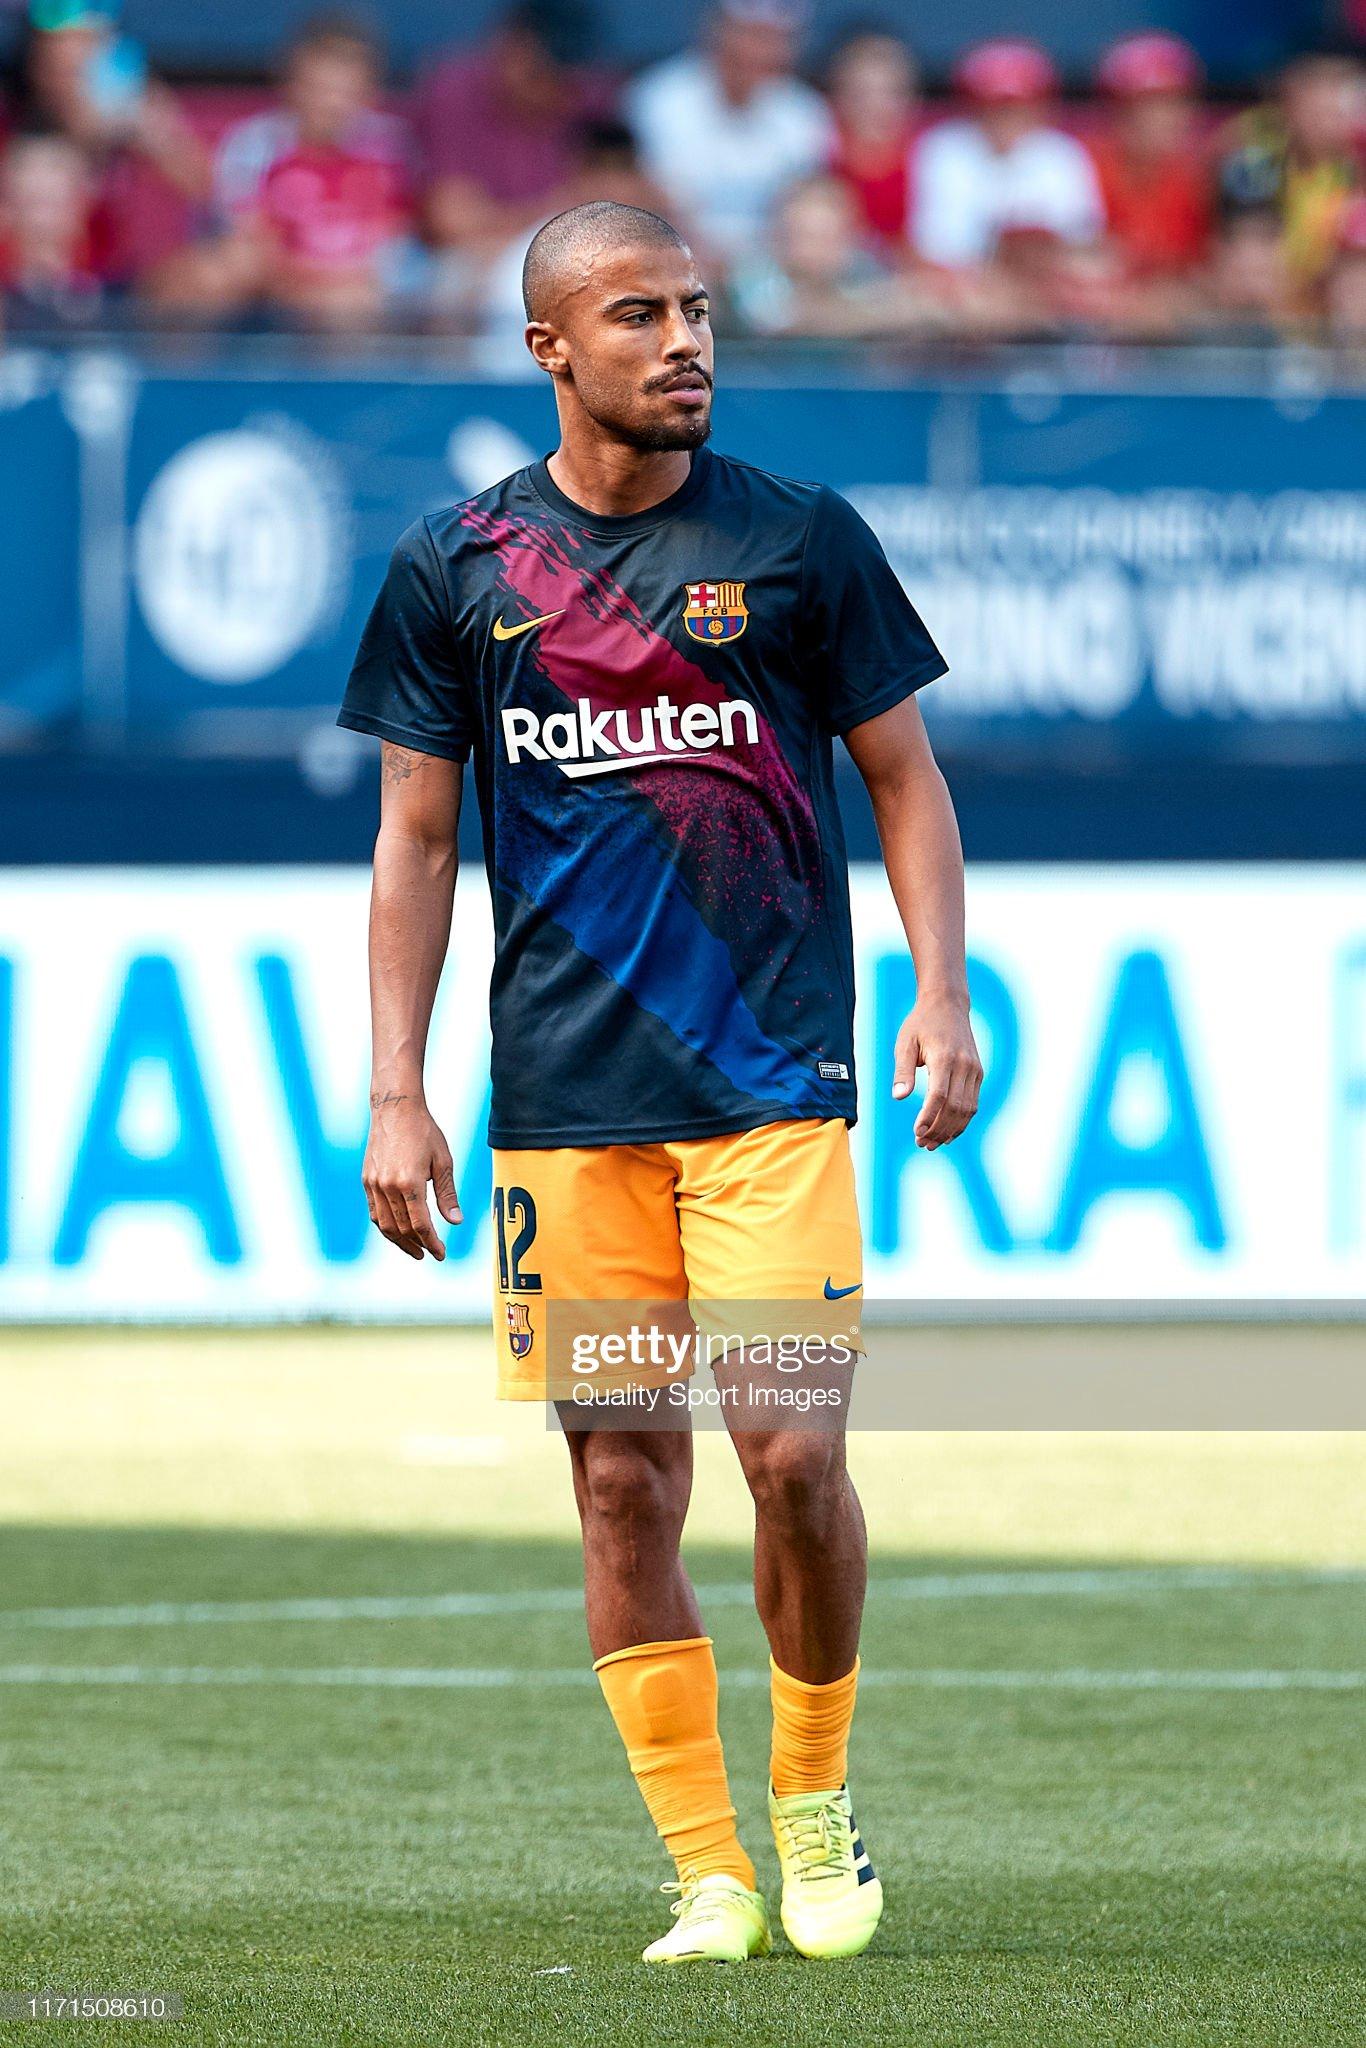 صور مباراة : أوساسونا - برشلونة 2-2 ( 31-08-2019 )  Rafinha-of-fc-barcelona-during-the-prematch-warm-up-prior-to-the-liga-picture-id1171508610?s=2048x2048